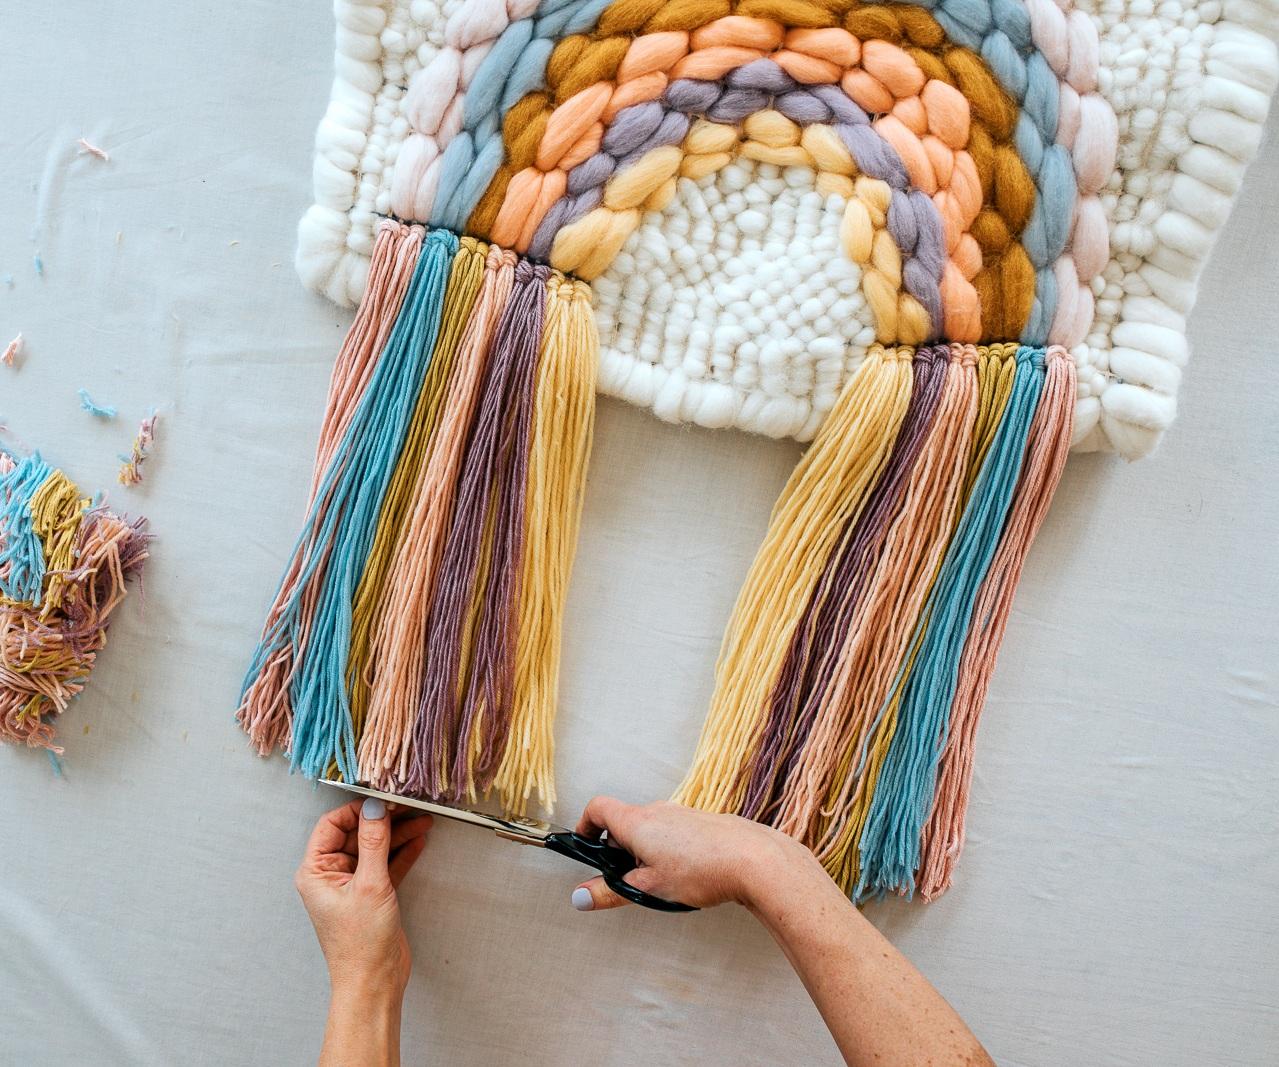 DIY_Rainbow_Wall_Hanging_by_Clever_Poppy3.jpg